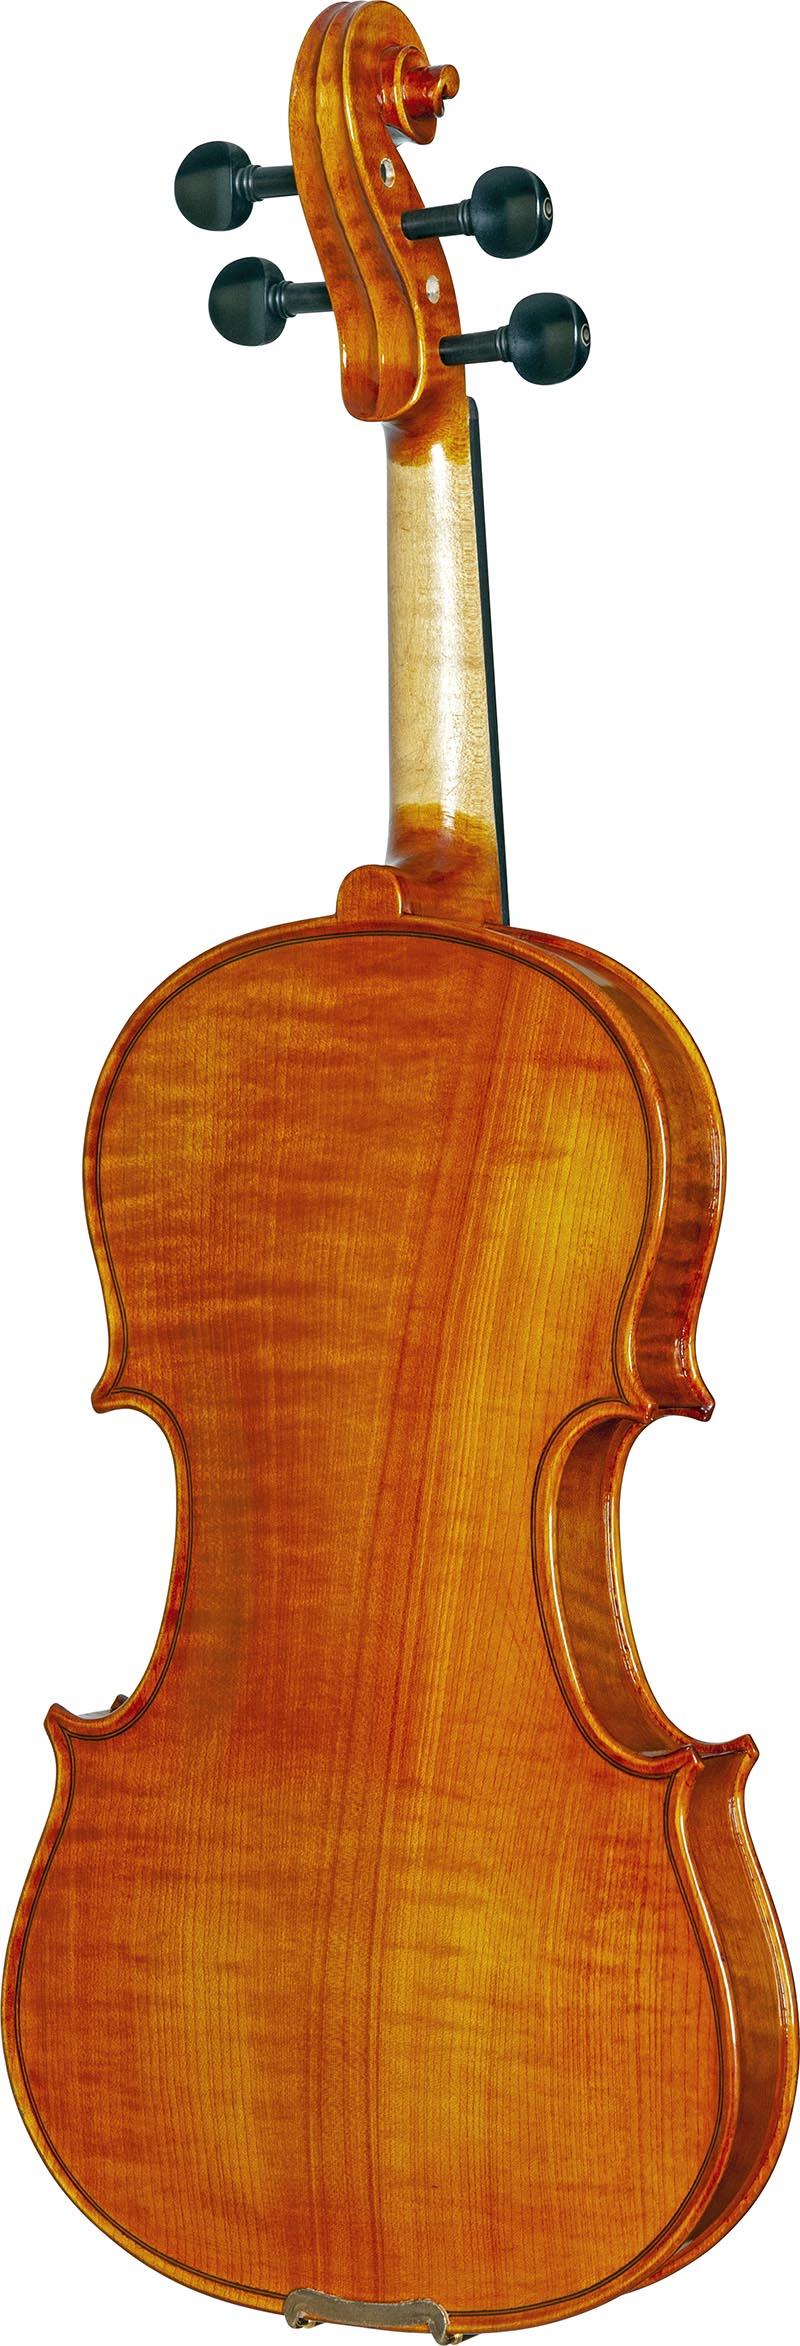 vk844 violino eagle vk844 visao posterior vertical